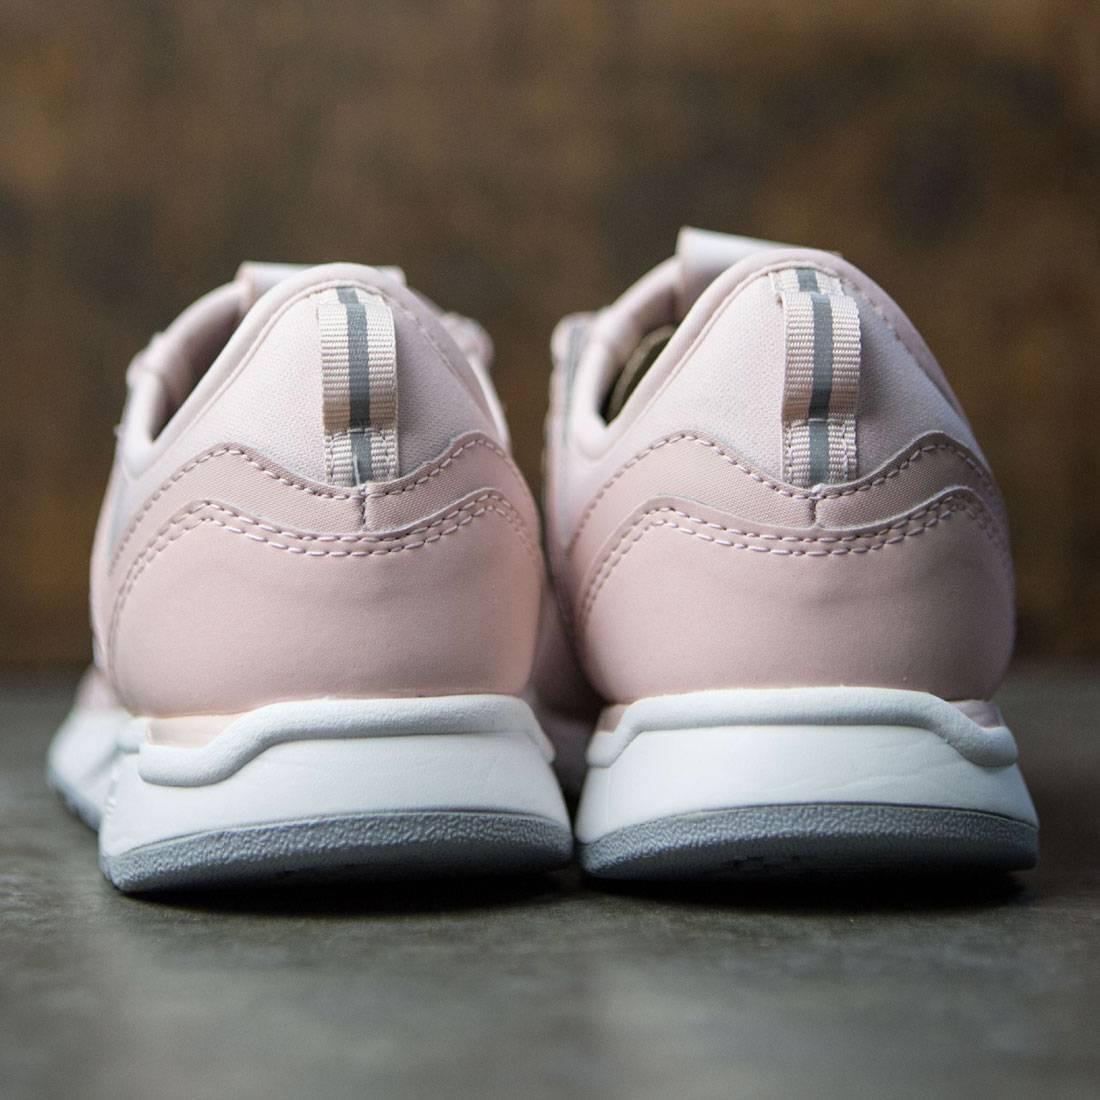 new balance 247 pink sandstone best new balance running shoe